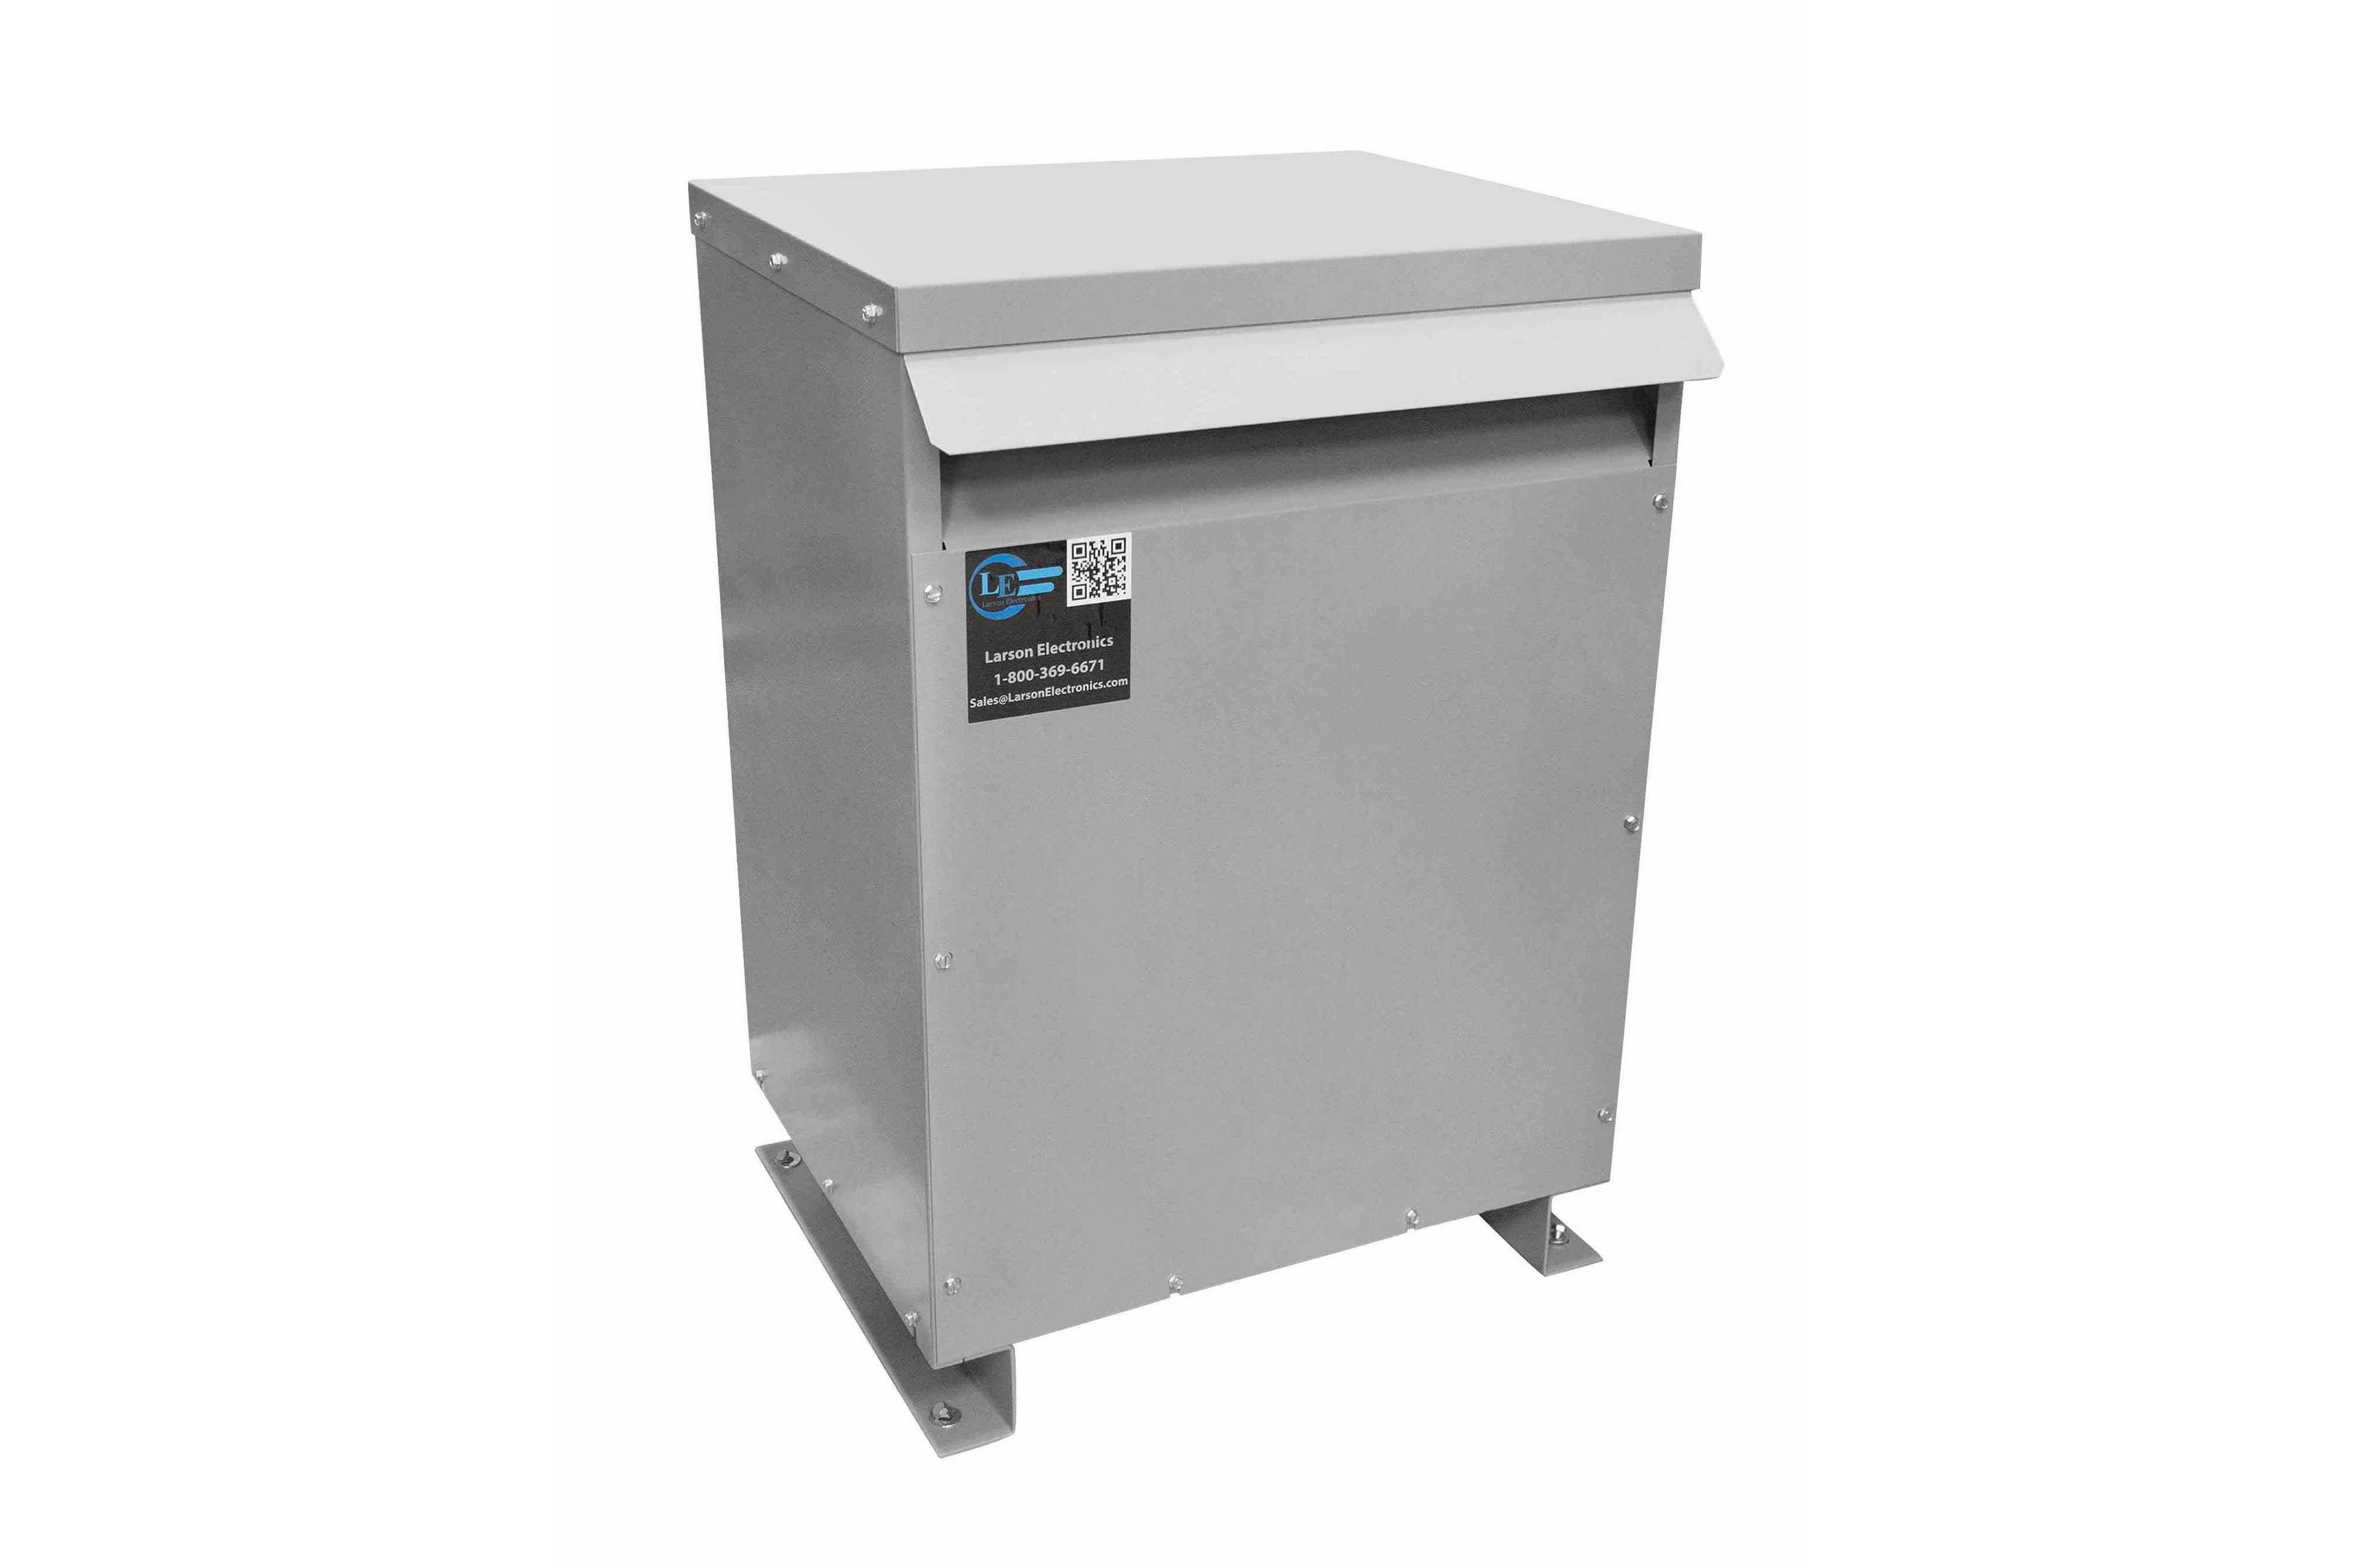 42.5 kVA 3PH Isolation Transformer, 575V Wye Primary, 208Y/120 Wye-N Secondary, N3R, Ventilated, 60 Hz